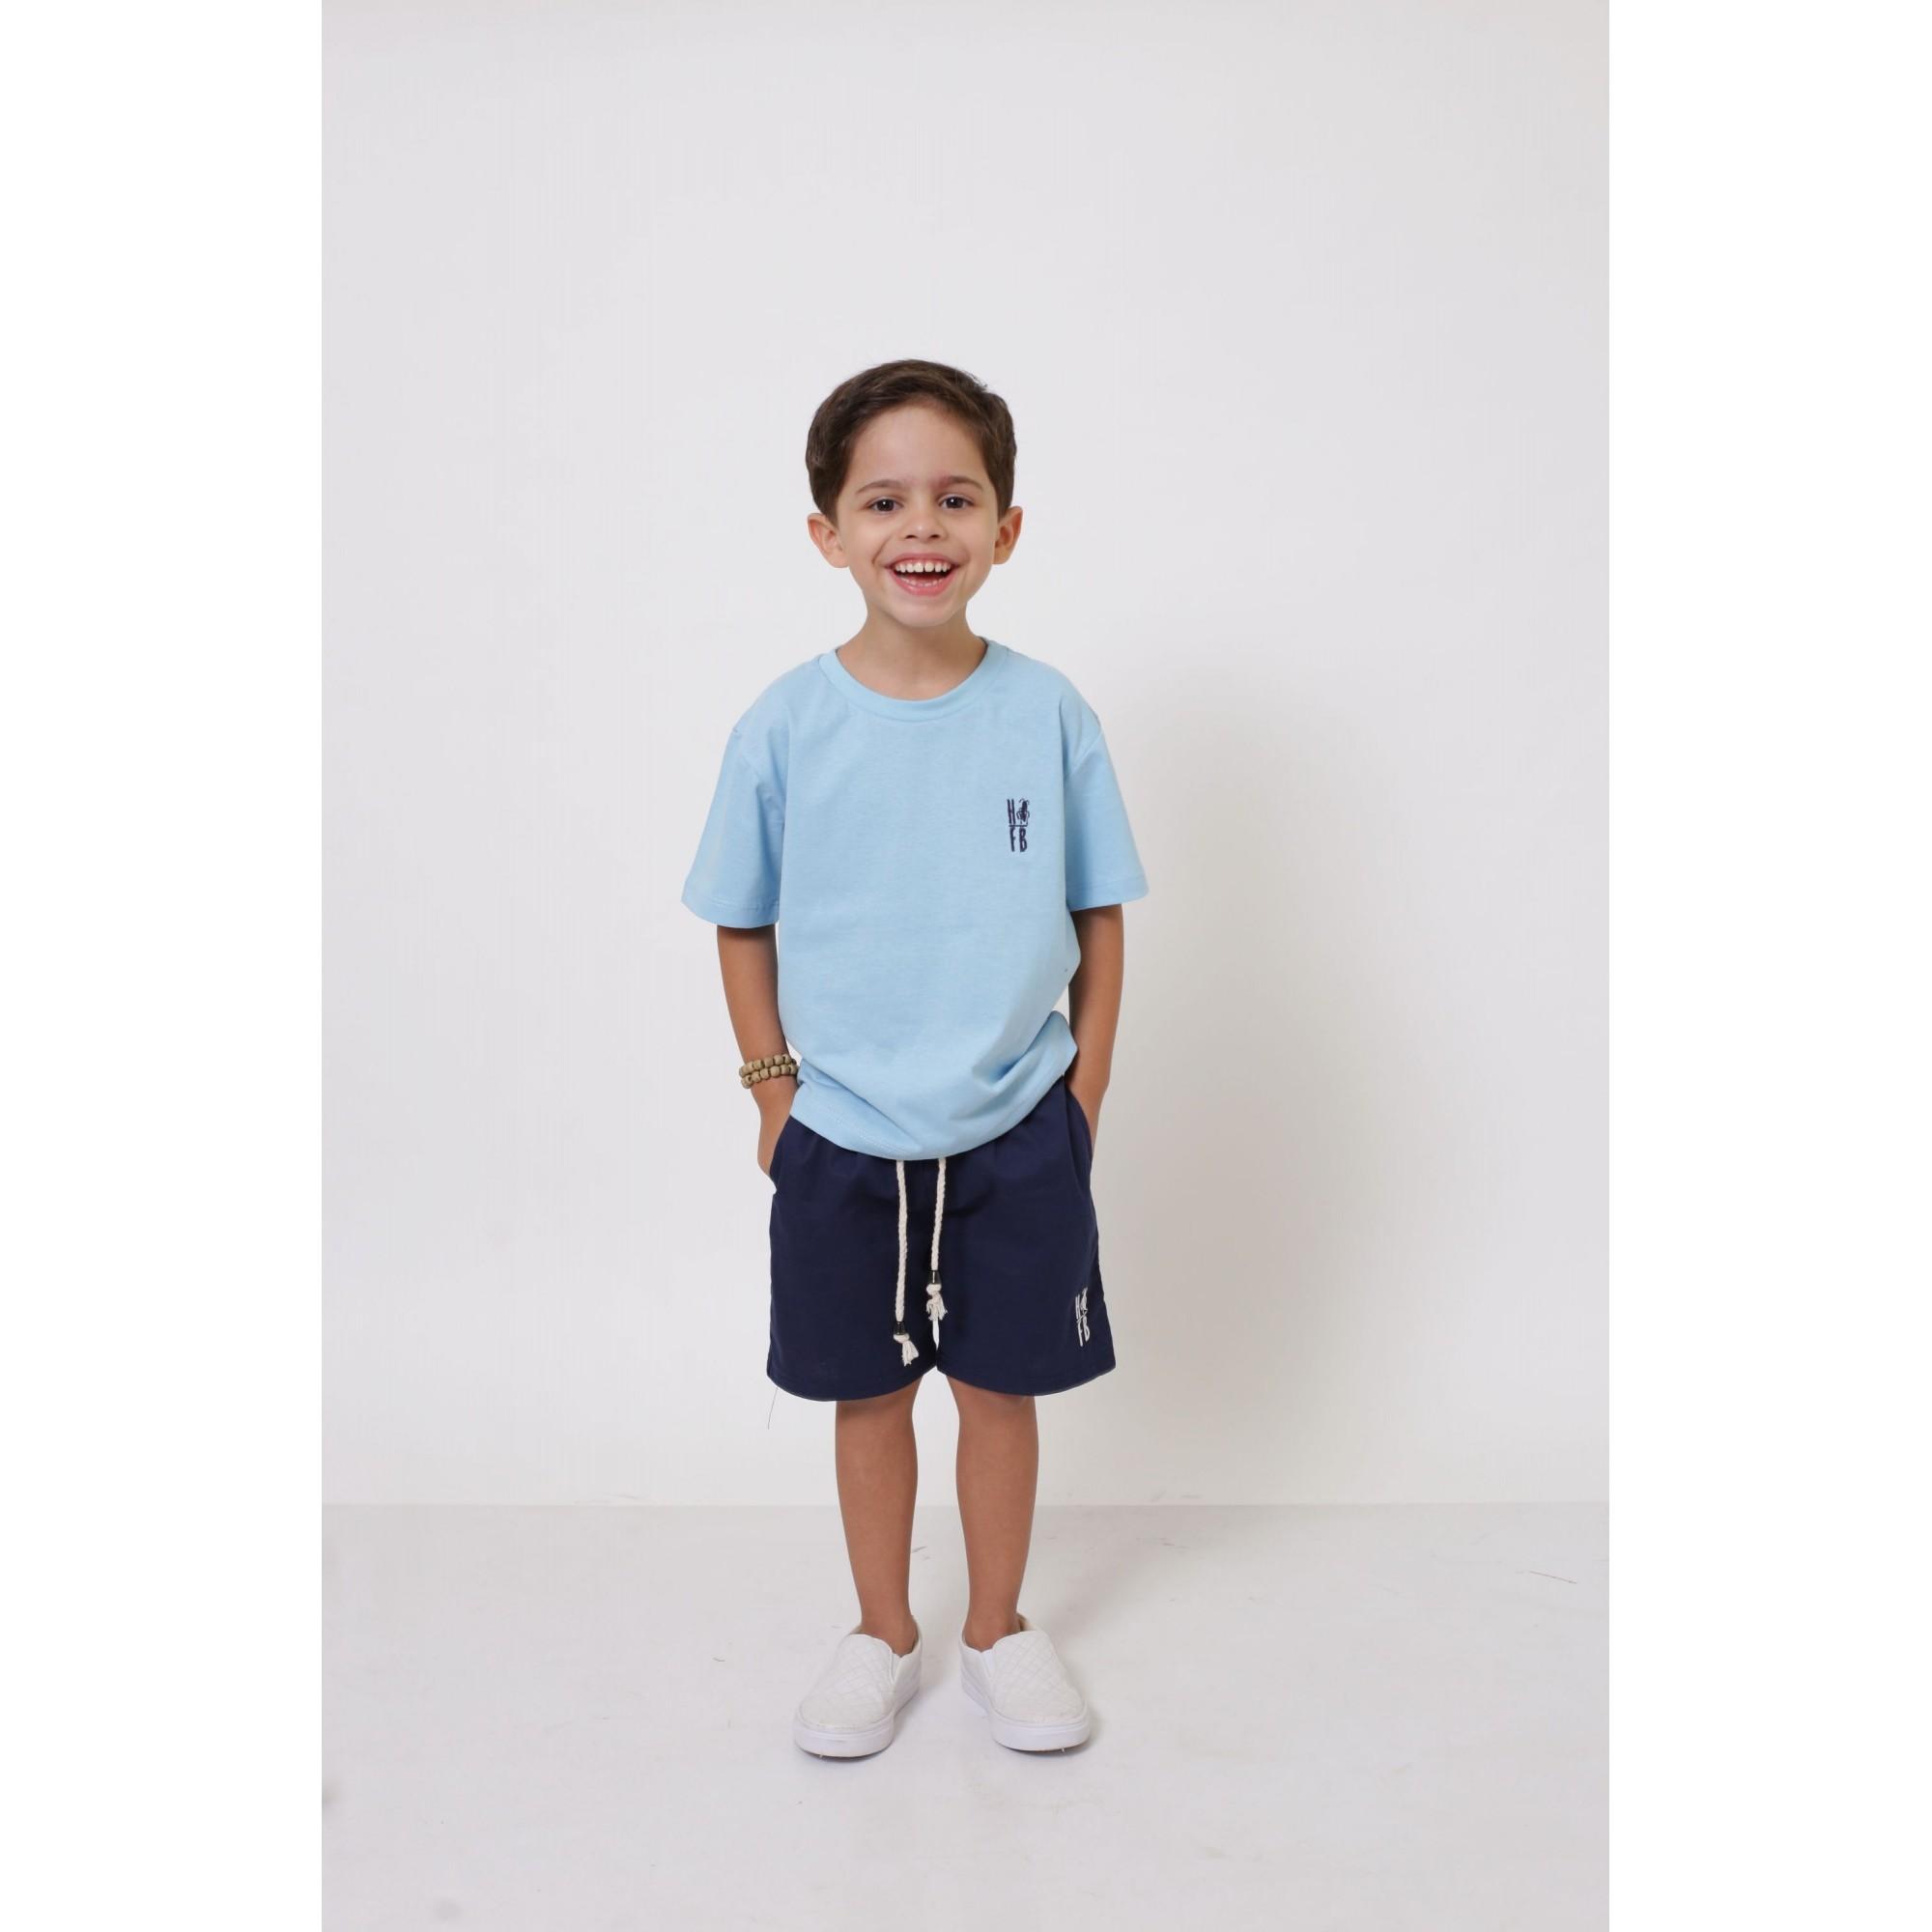 Camiseta ou Body Infantil Unissex - Azul Bebê